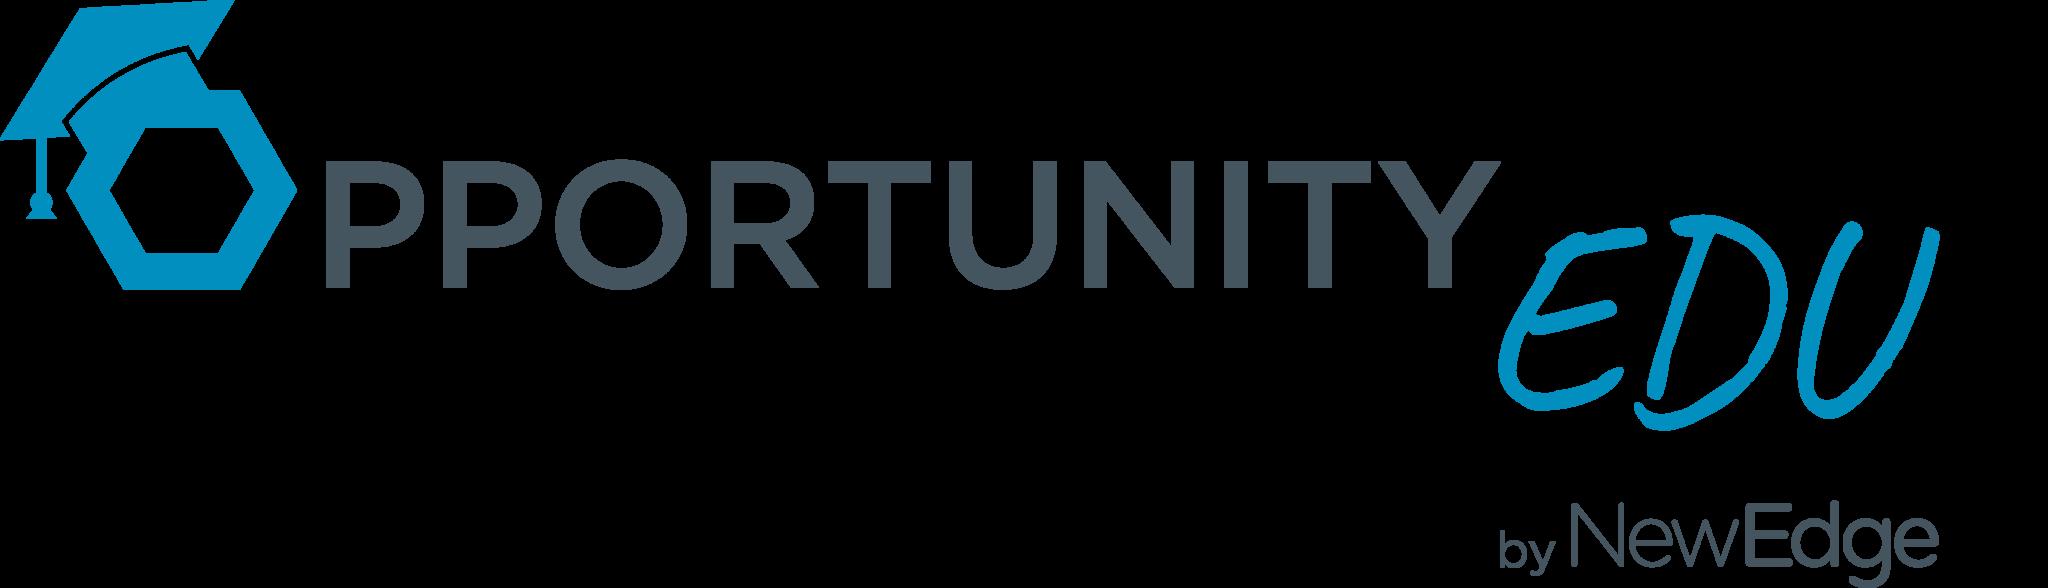 Opportunity EDU